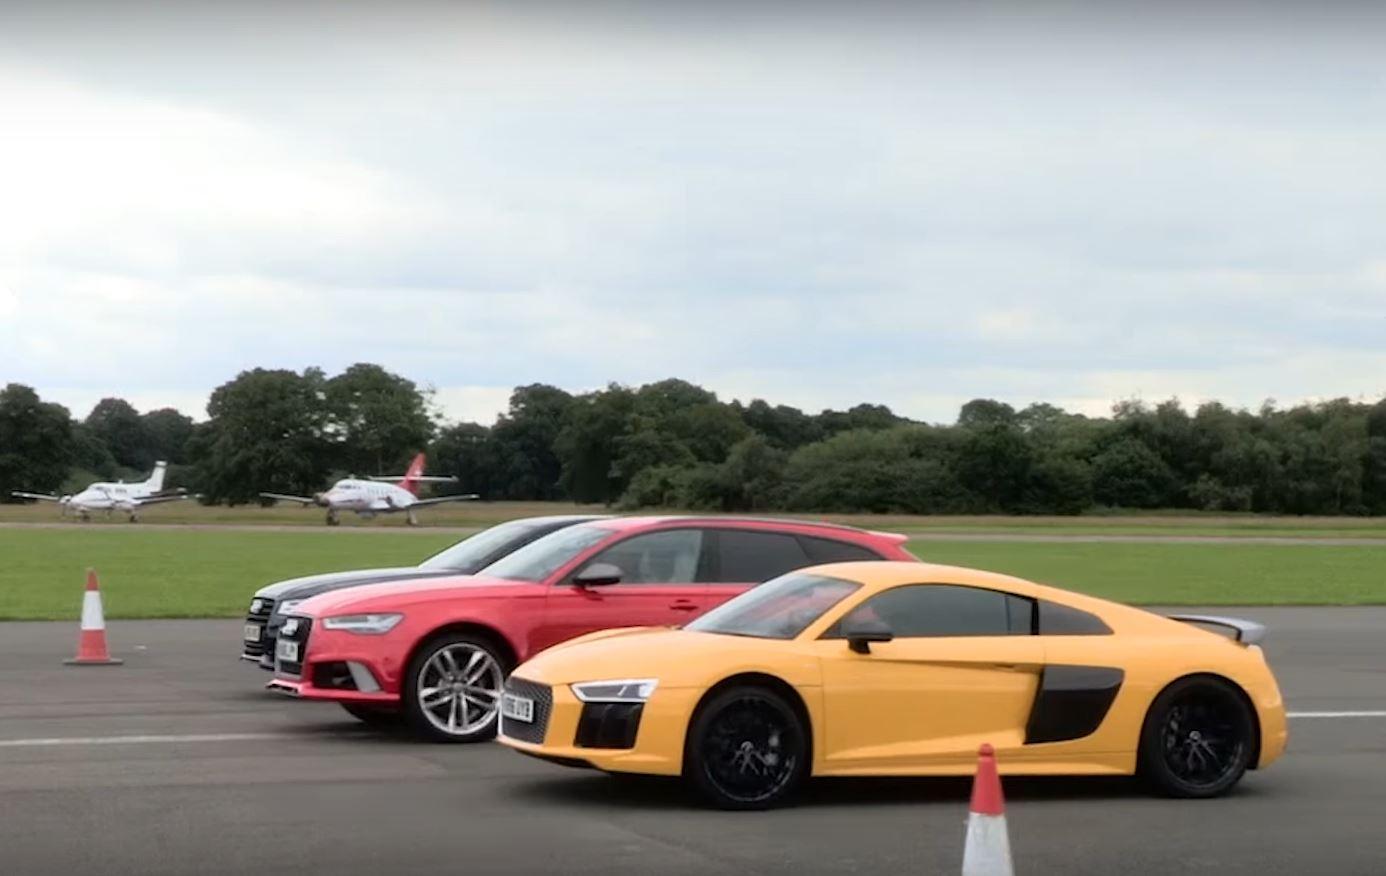 Audi R8 V10 Plus vs. RS6 vs. S8: The Lord of the Rings Drag Race - autoevolution